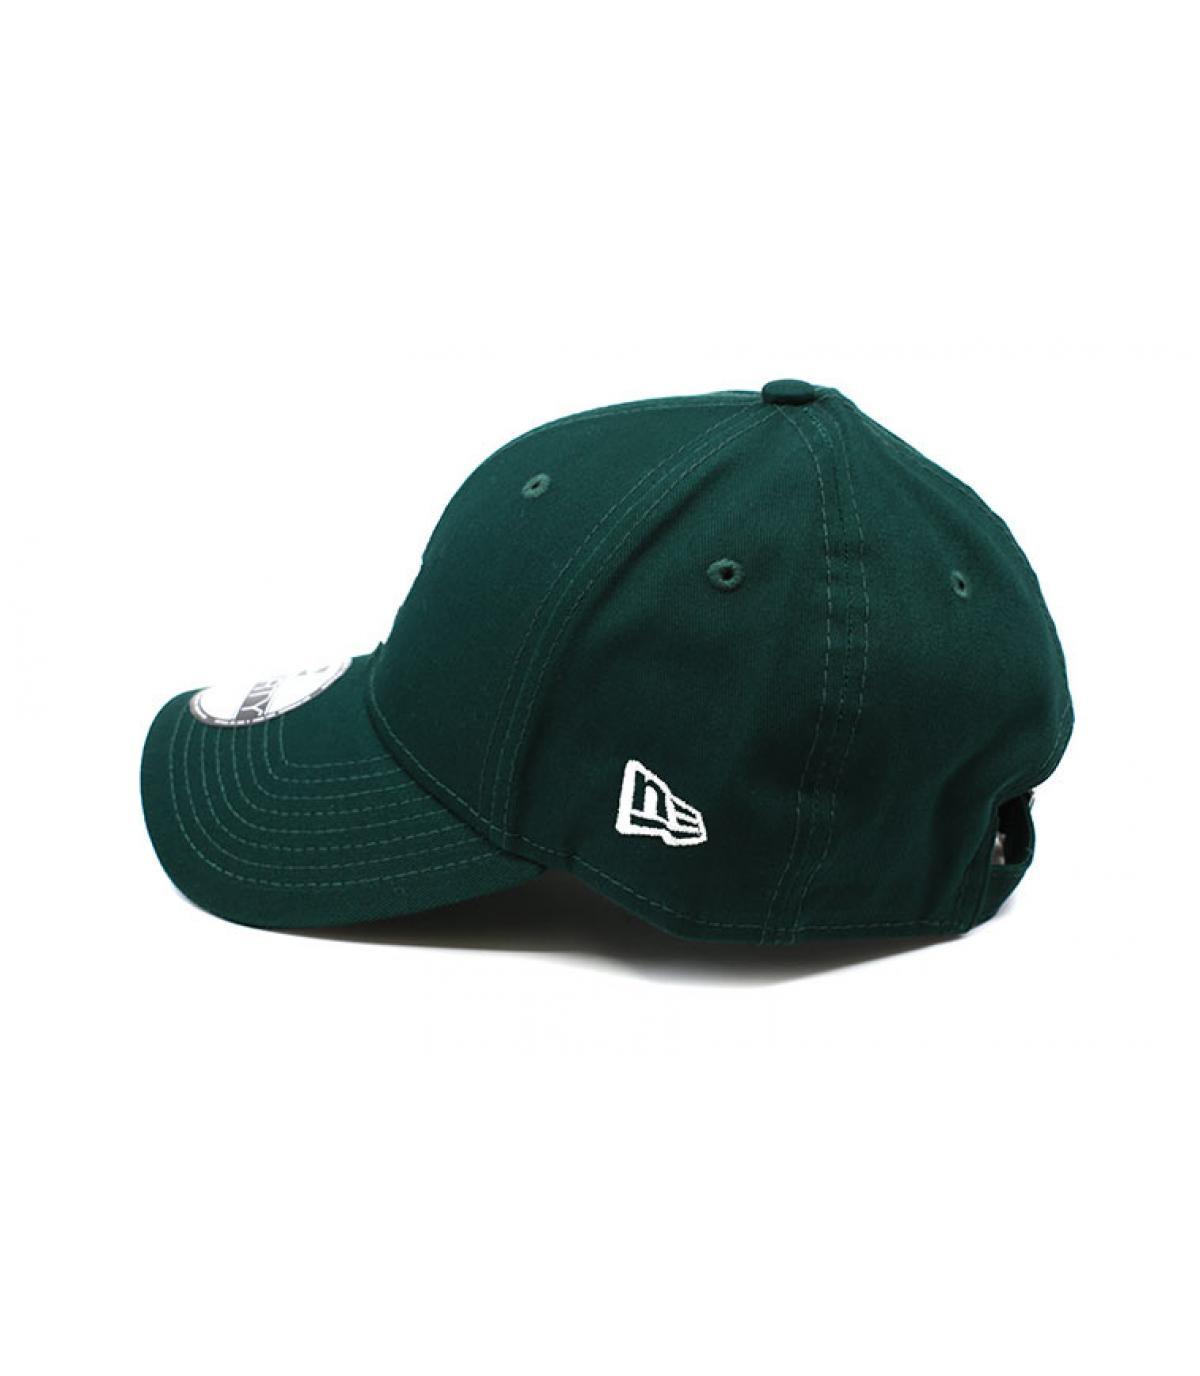 Details League Ess 9Forty LA dark green - afbeeling 4